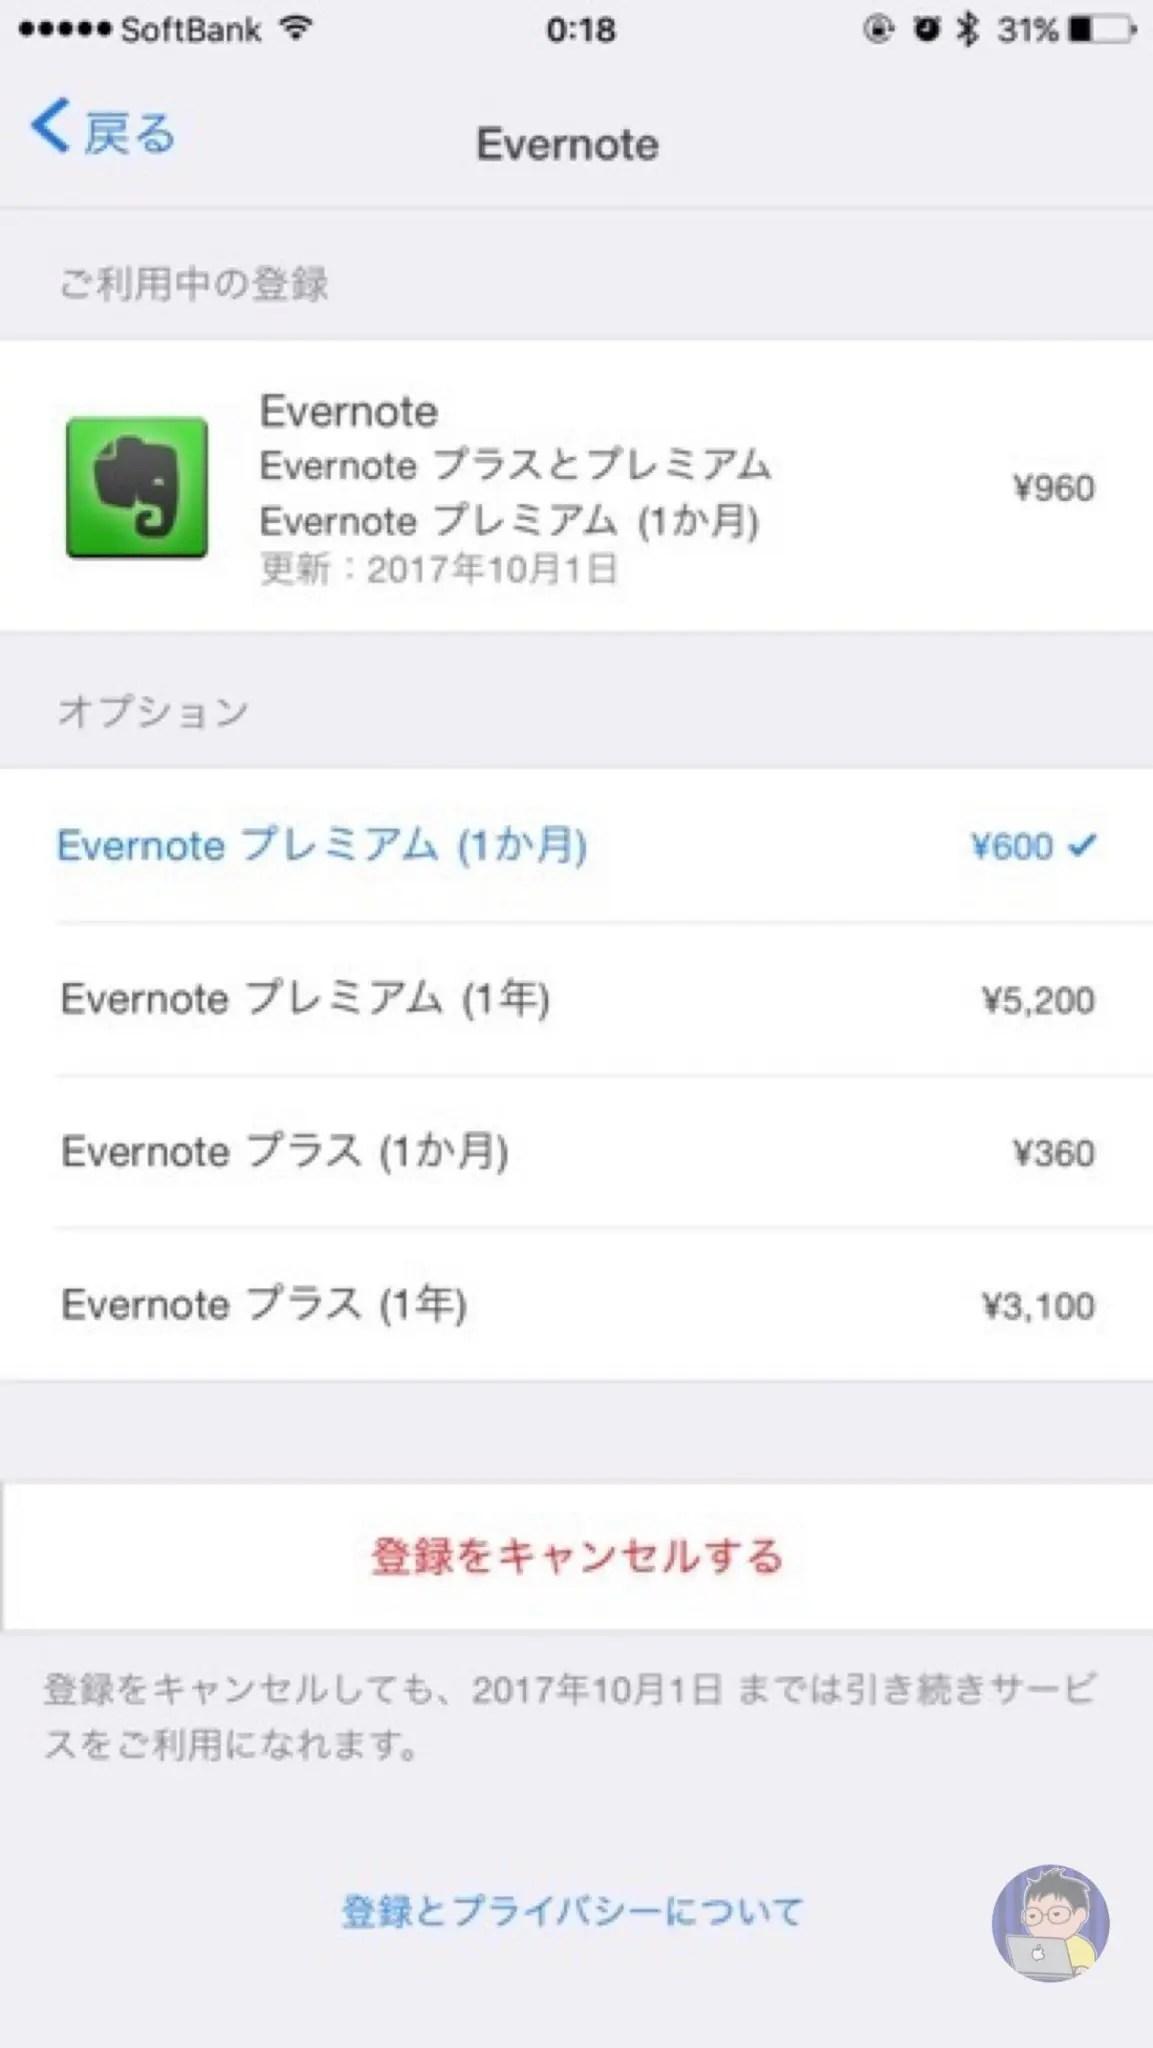 Evernoteプレミアム会員価格・・・特に値上がりはなく月額料金600円をキープ!〜何かのエラーか?〜